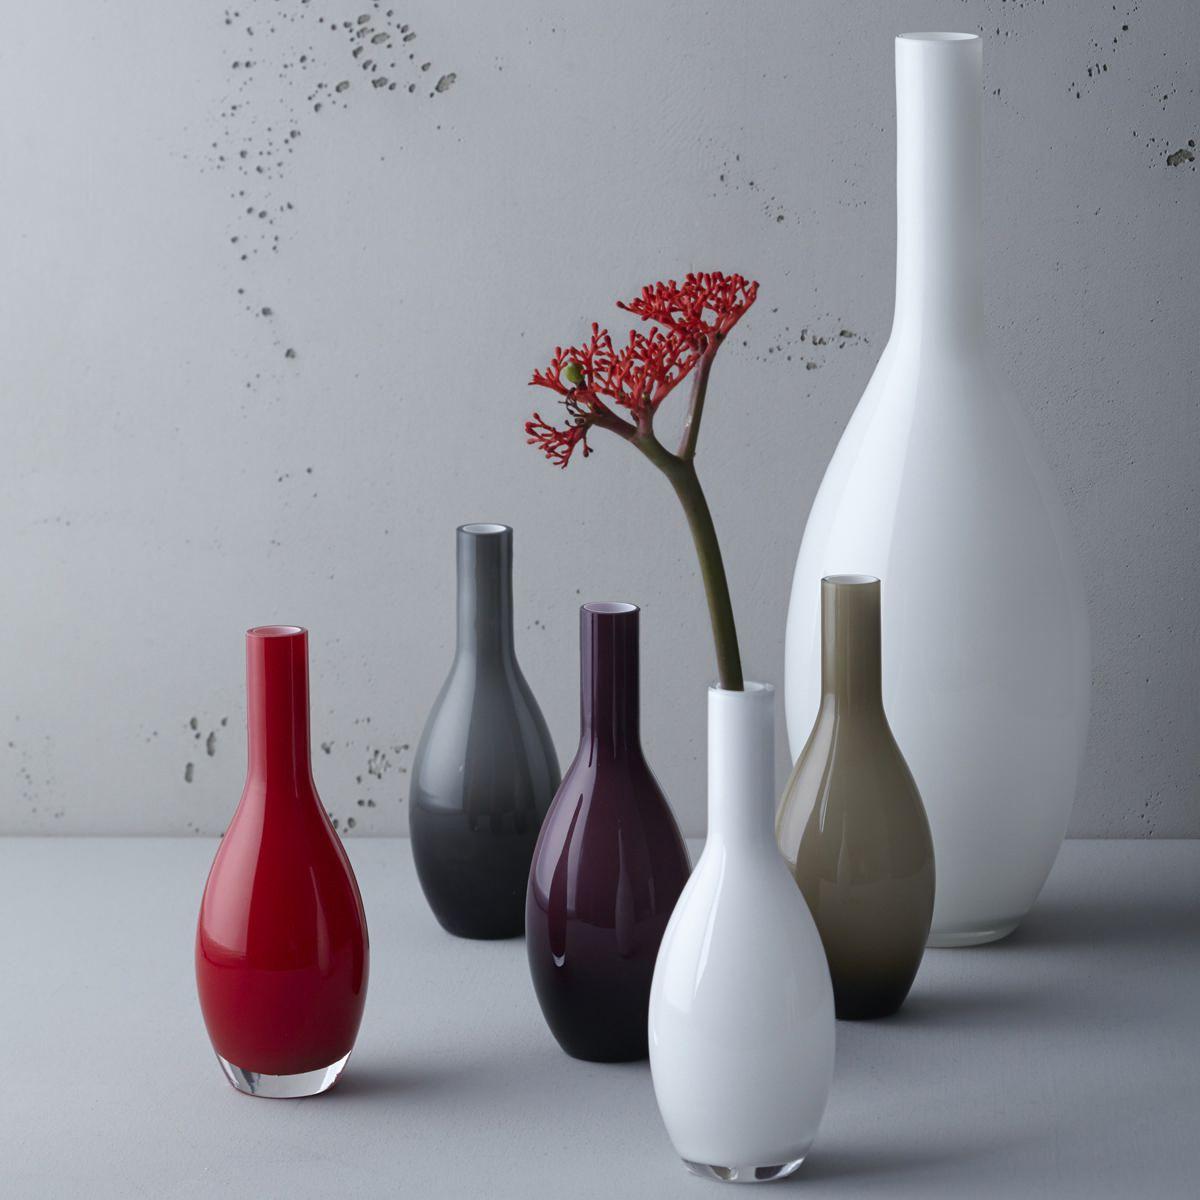 Leonardo Vase Beauty 50cm gruen N 002.xxl3  1 - Vază Beauty grey 39 cm (L070408)